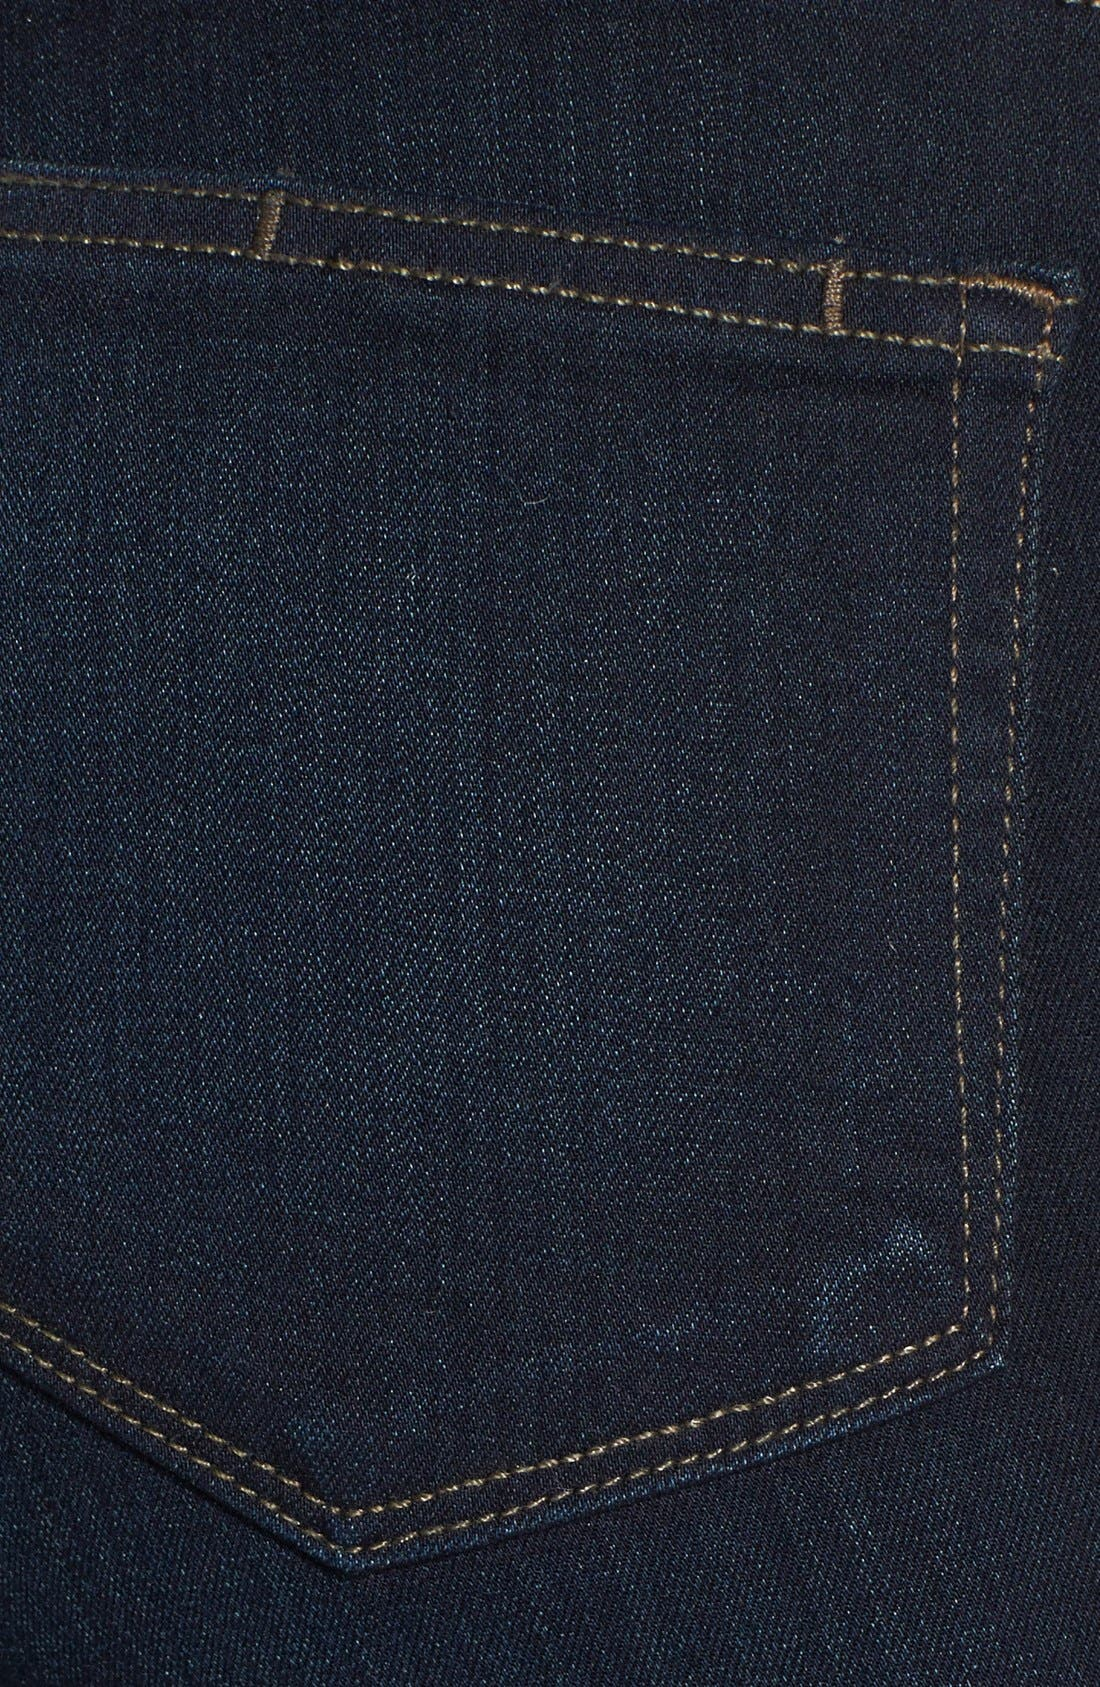 PAIGE, Transcend - Hoxton High Waist Ultra Skinny Jeans, Alternate thumbnail 6, color, MONA